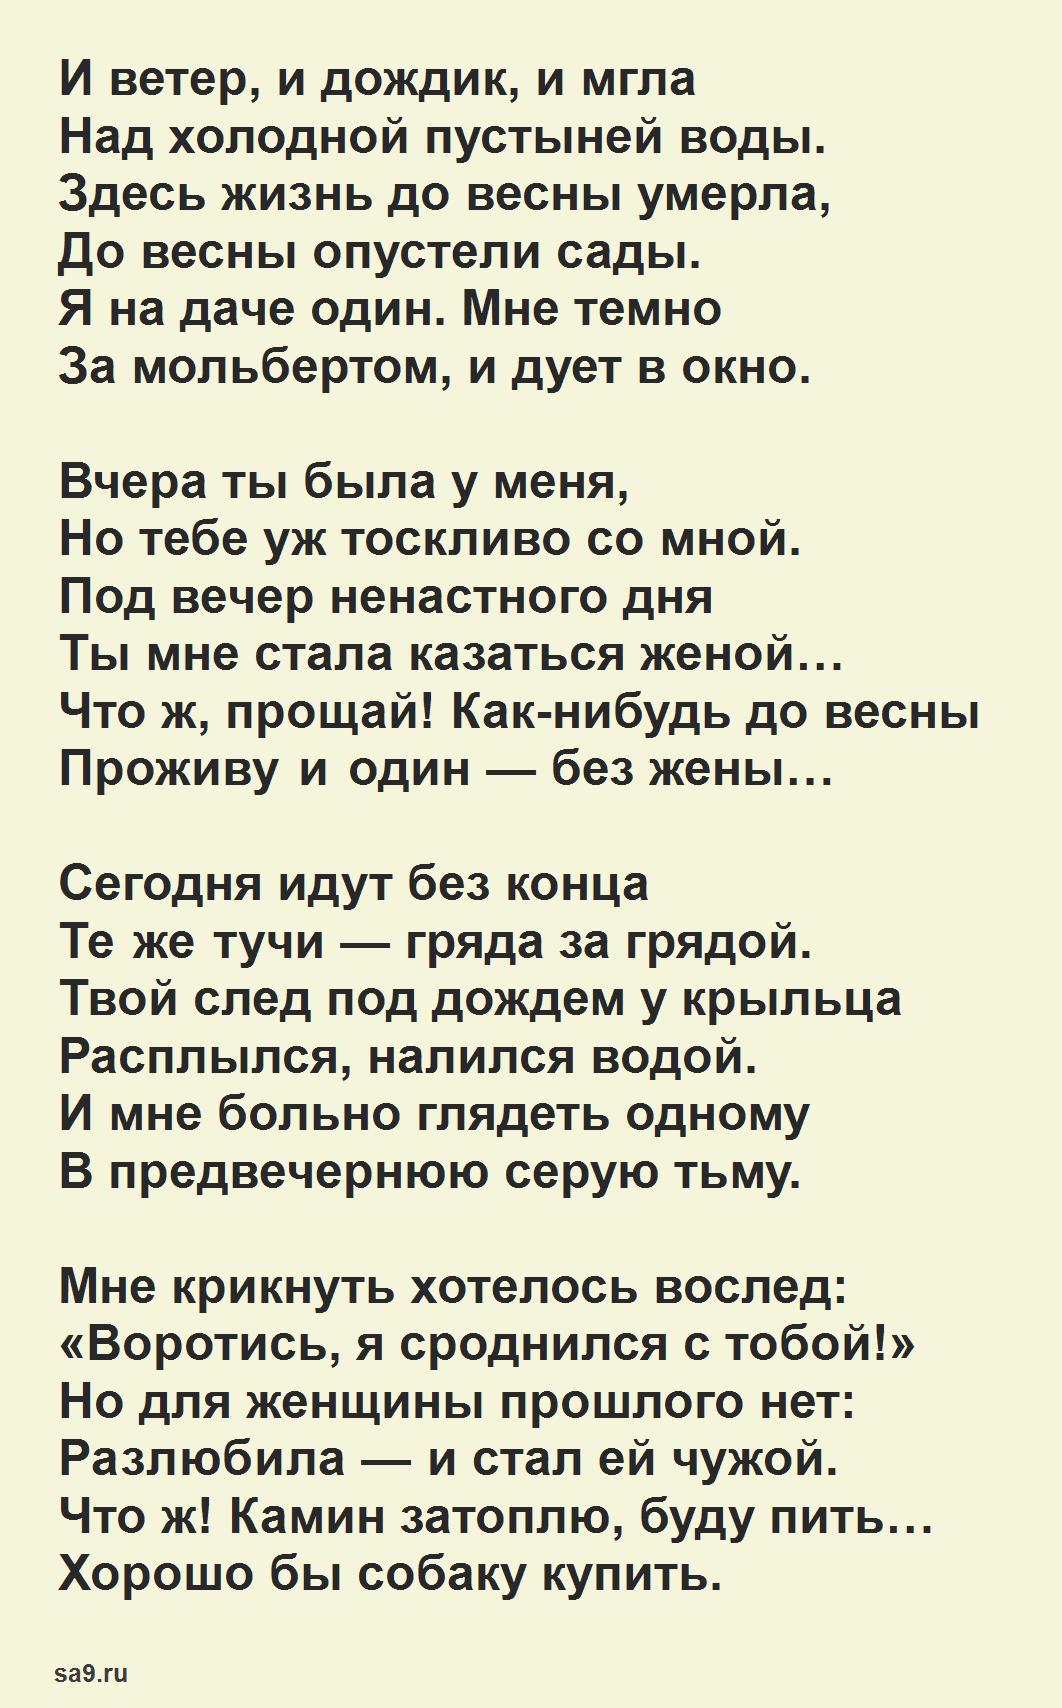 Стих - Одиночество, Бунин